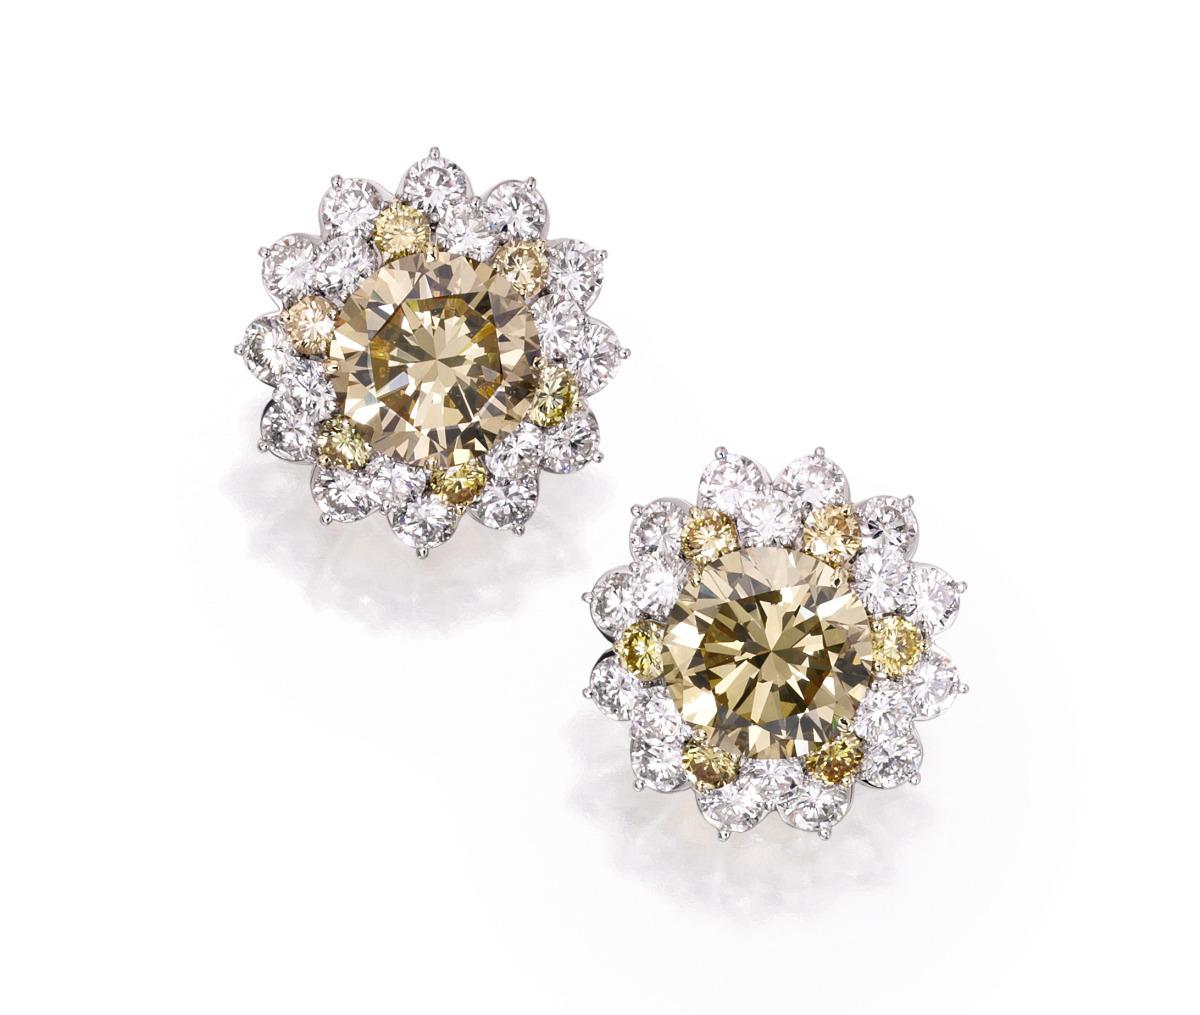 Pair of Platinum, 18 Karat Gold, Colored Diamond and Diamond Earclips, Van Cleef & Arpels